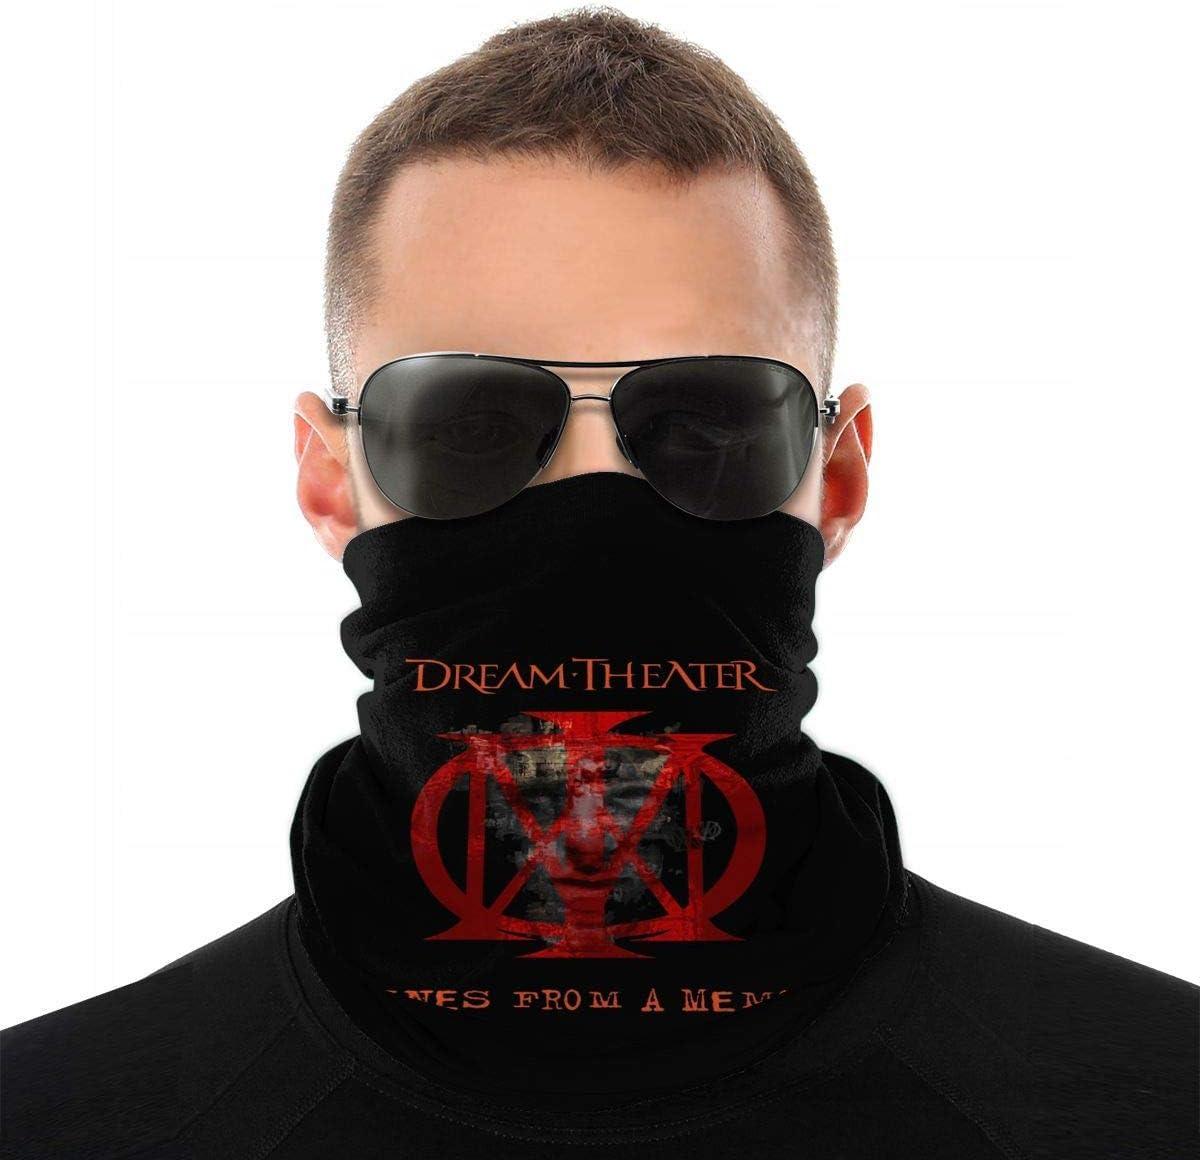 Not Applicable 12-In 1 Headbands,Dream Theater 16-En-1 Bandas De Sudor Sombreros Suaves para Protecci/ón UV Al Aire Libre,25x50cm